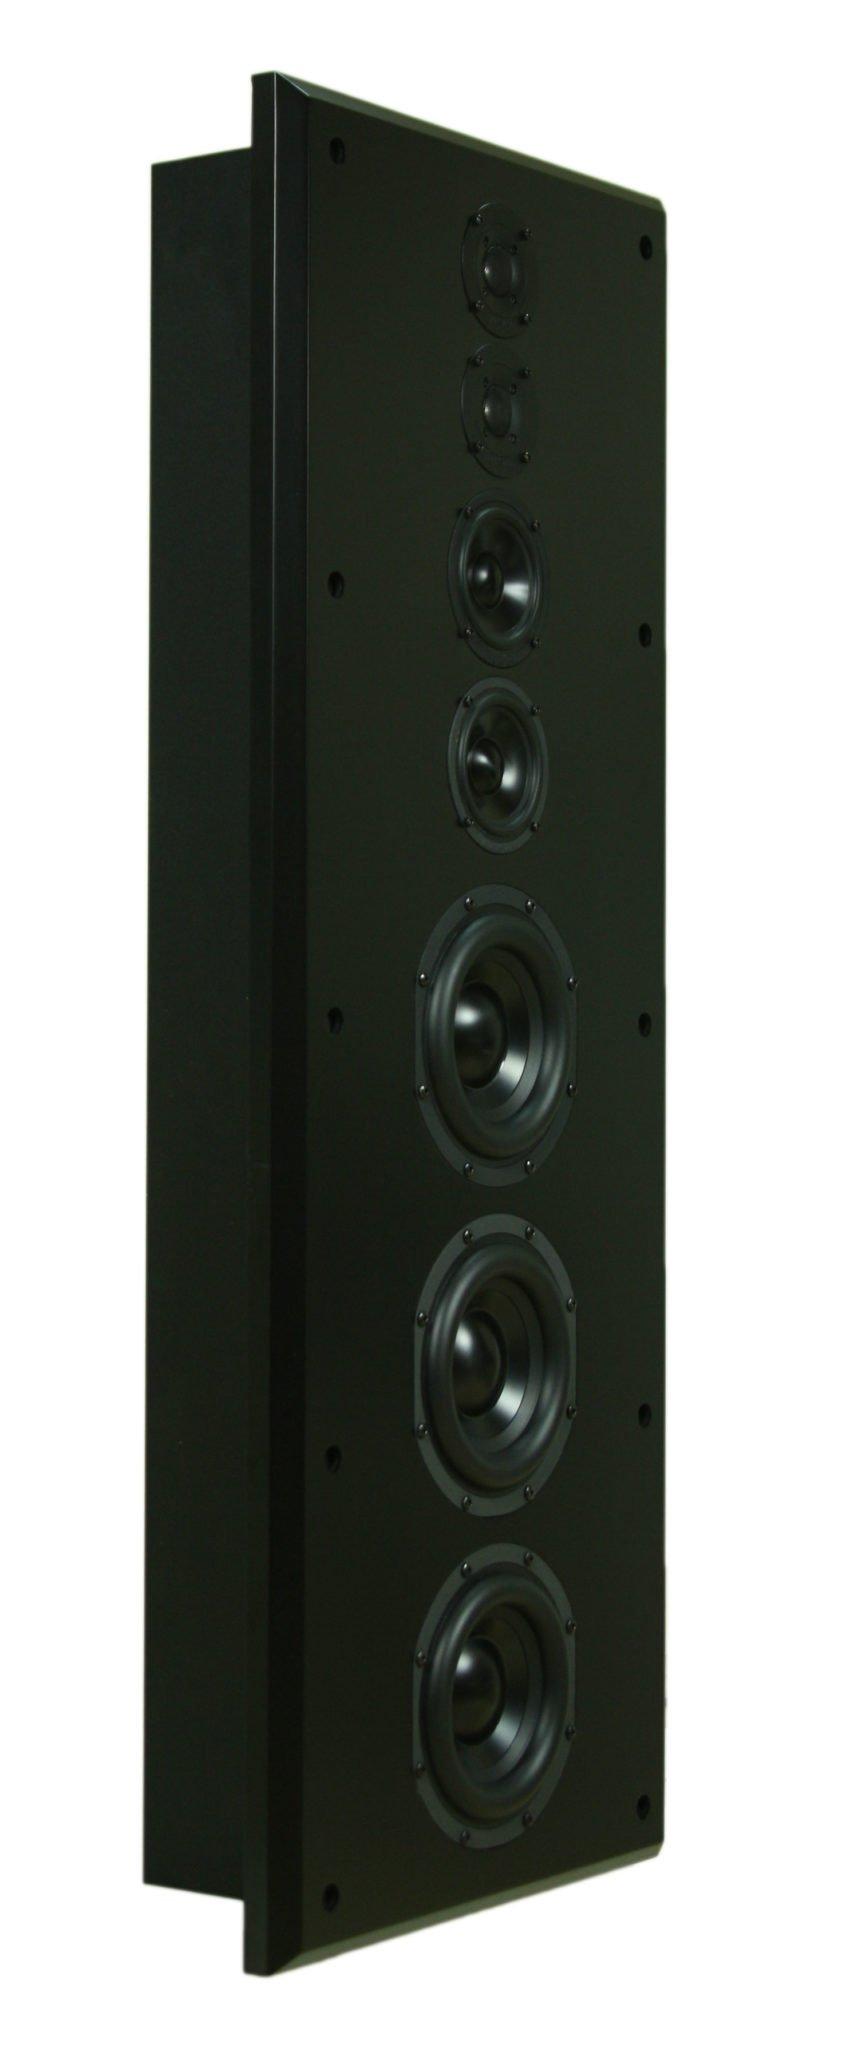 Bryston Introduce Model T Cinema In-Wall Loudspeakers